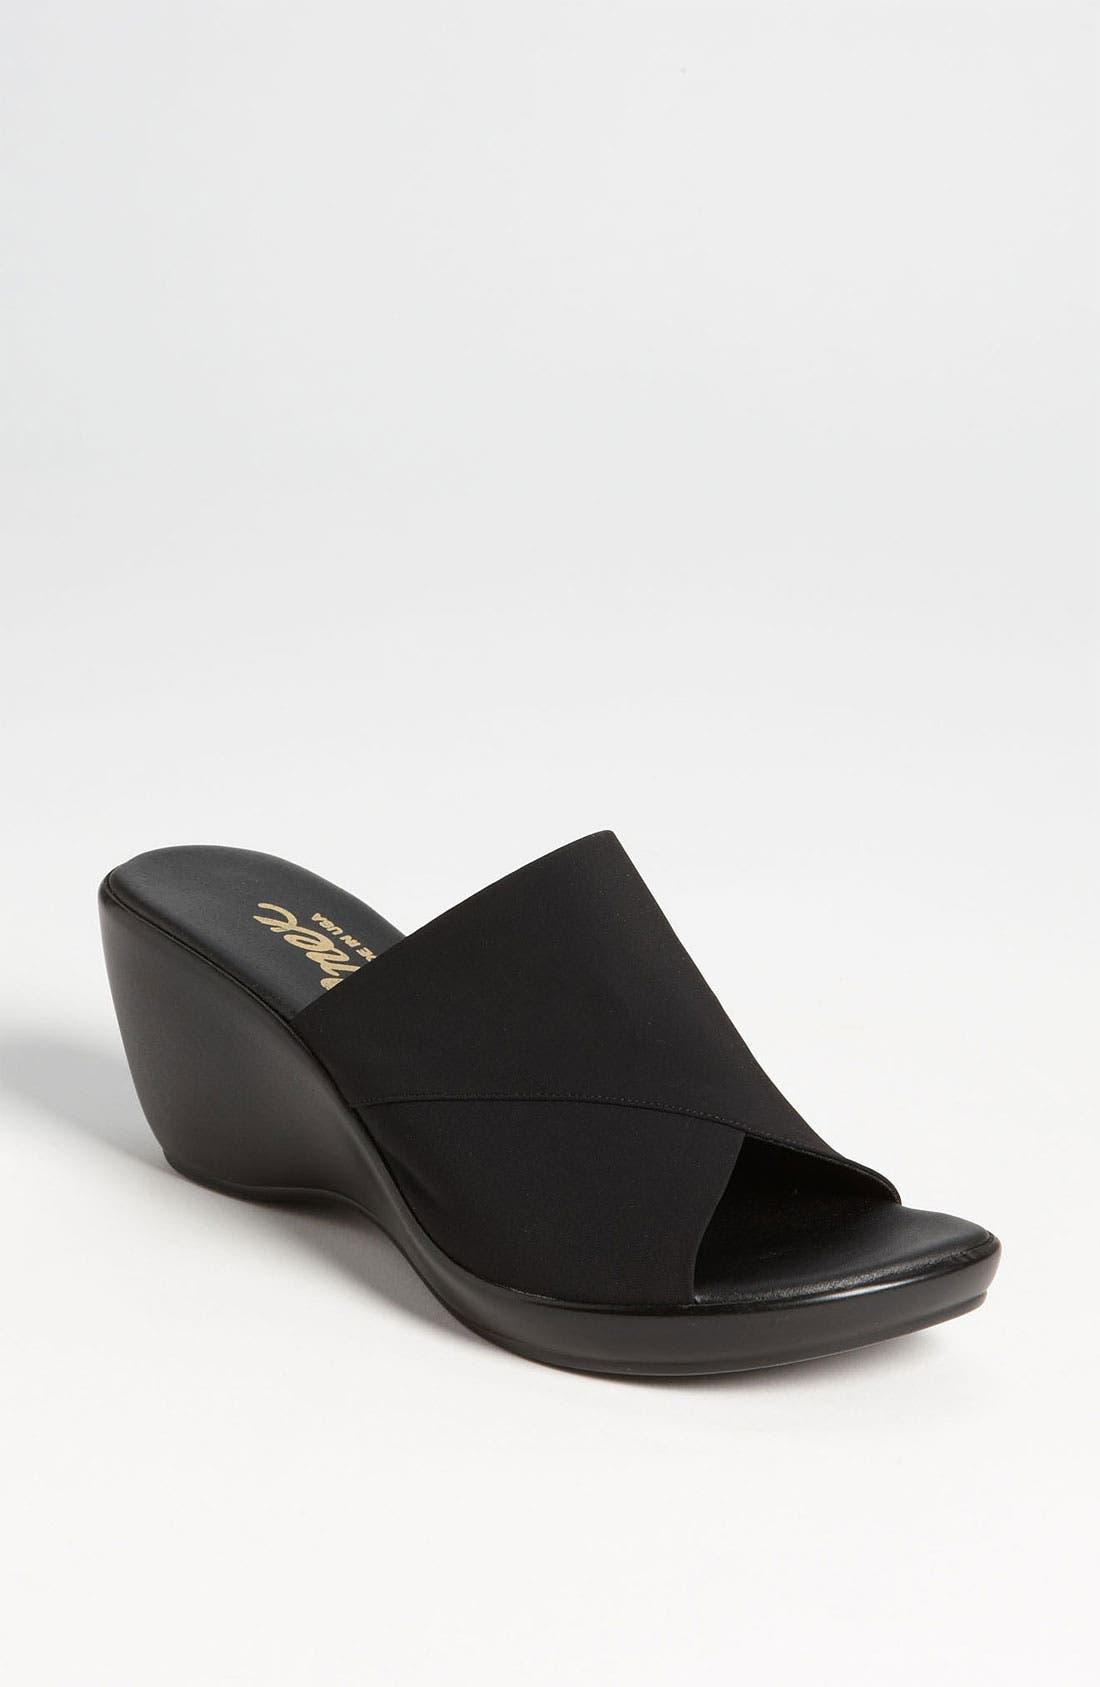 Main Image - Onex 'Deena' Wedge Sandal